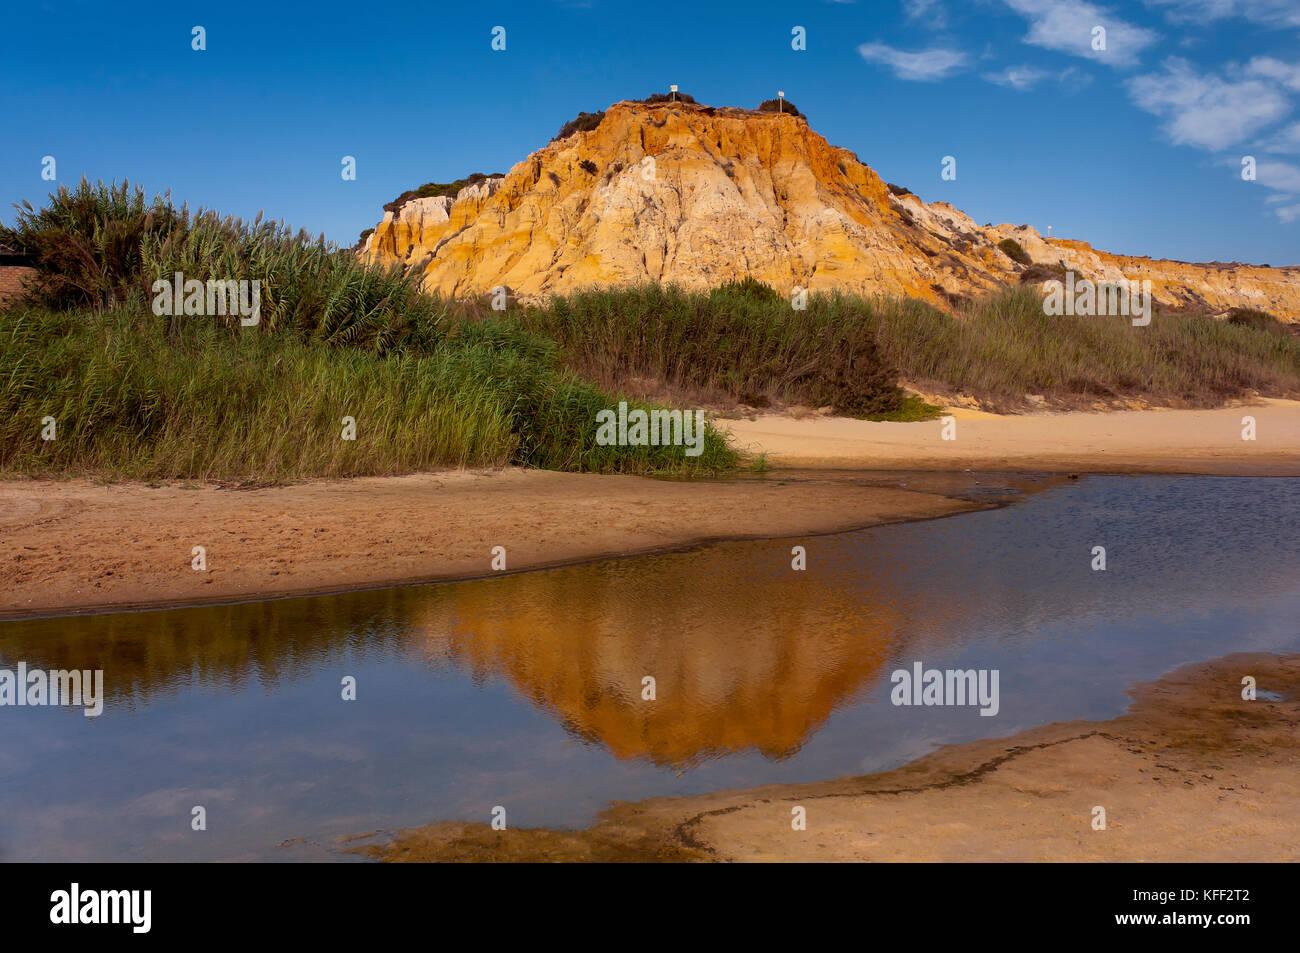 Torre del Loro beach and Dune of the Asperillo, Entorno de Donana Natural Park, Mazagon, Moguer, Huelva province, - Stock Image